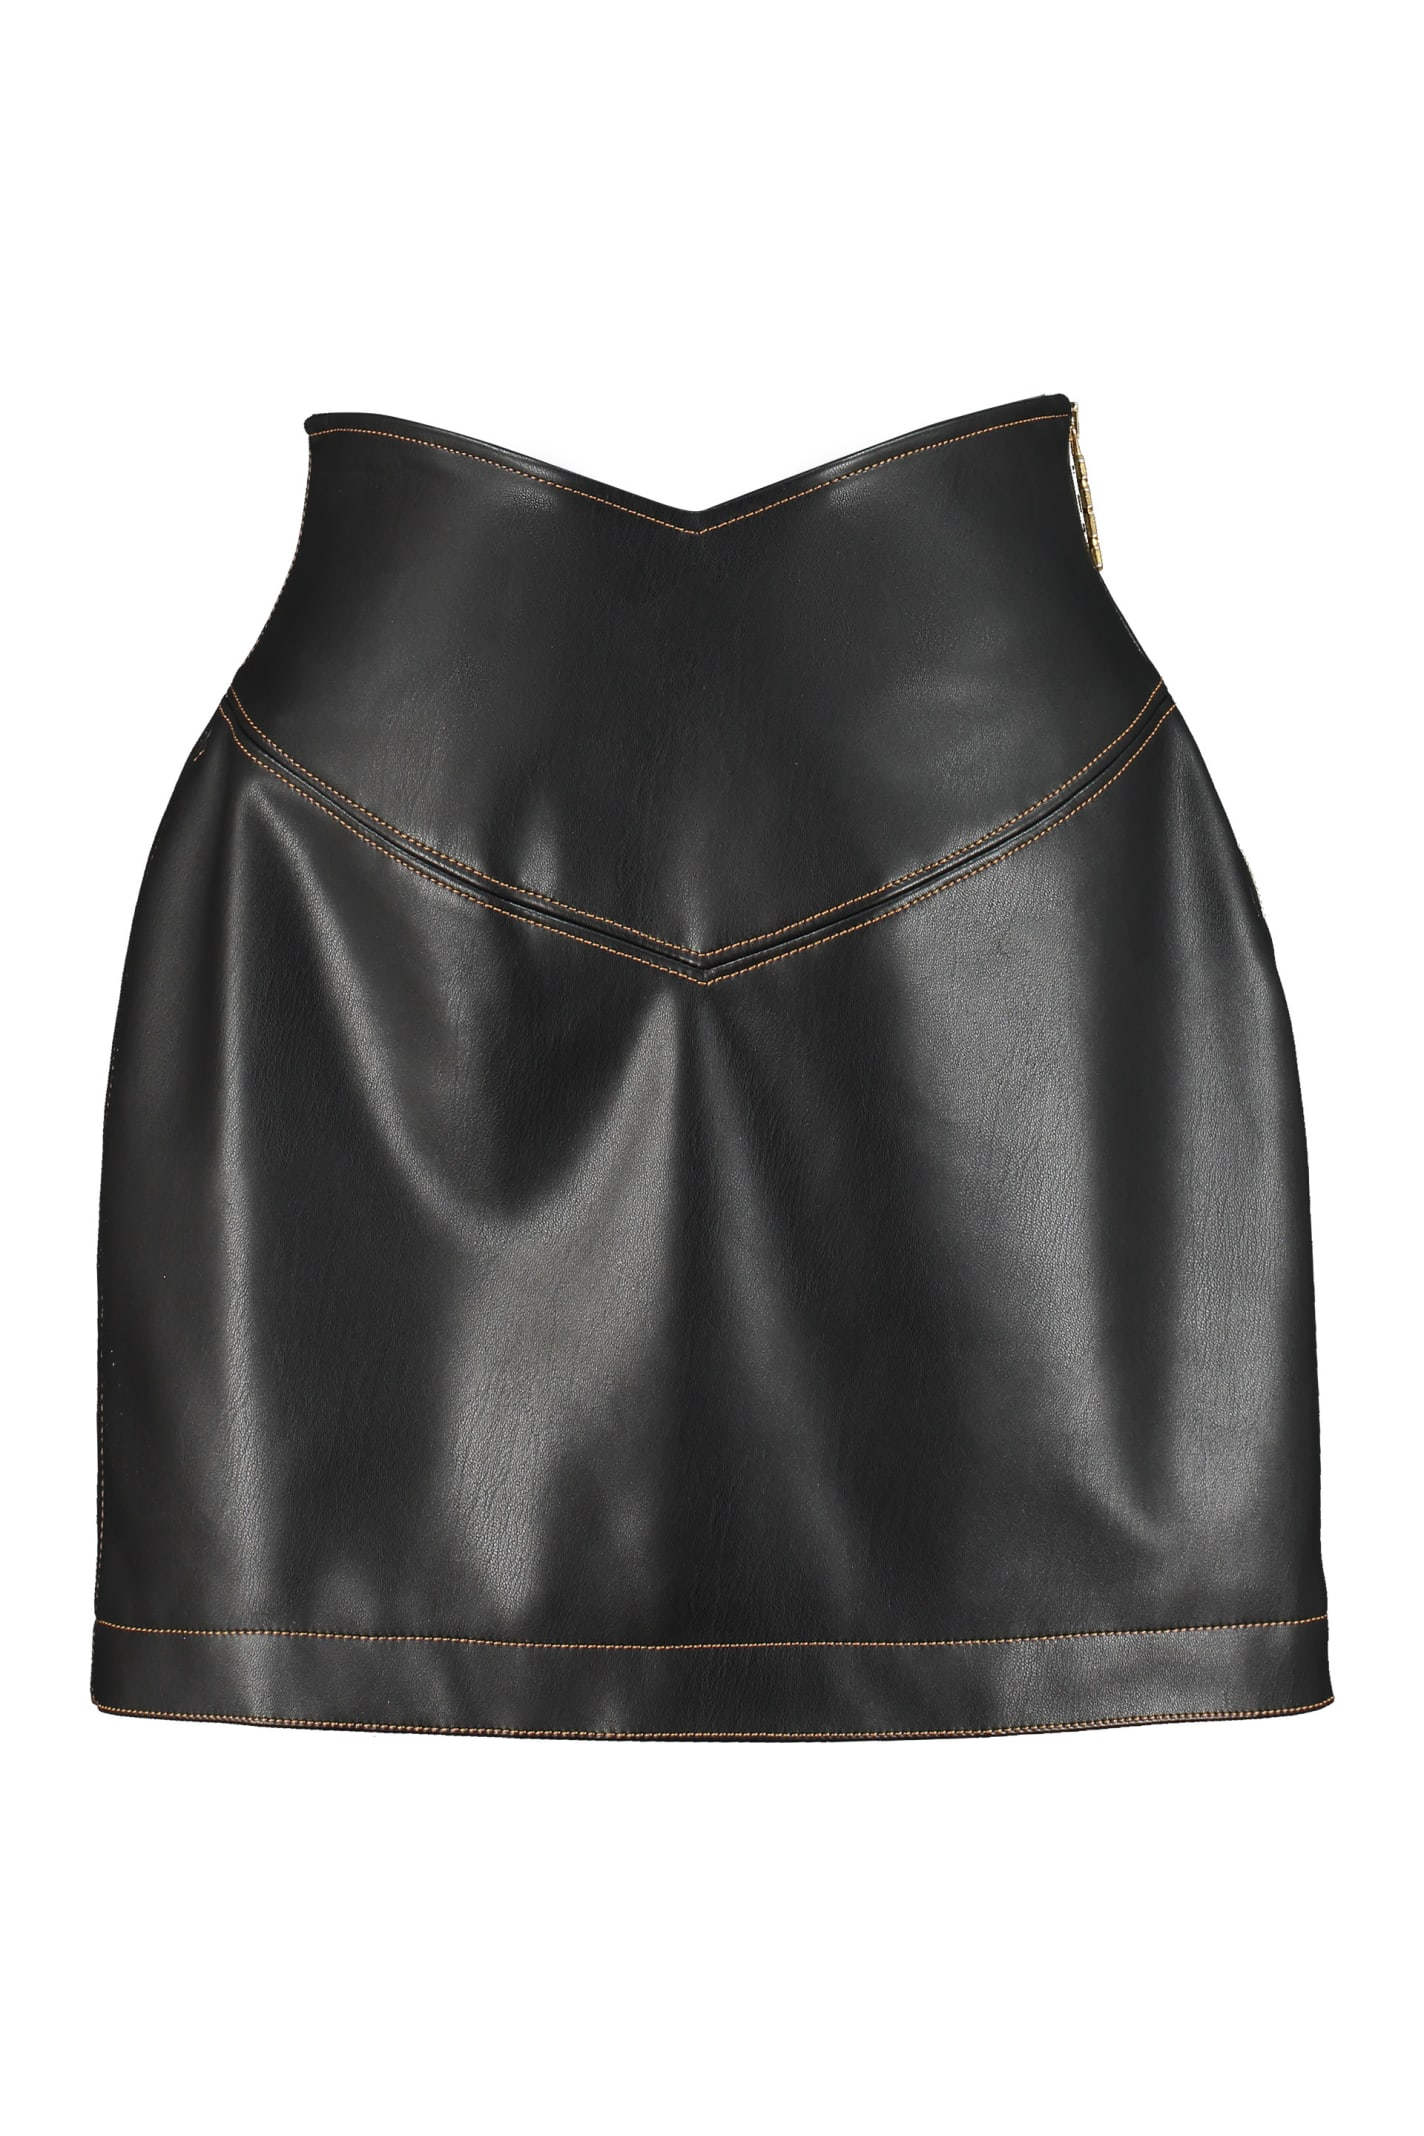 Gcds Faux Leather Mini Skirt In Black